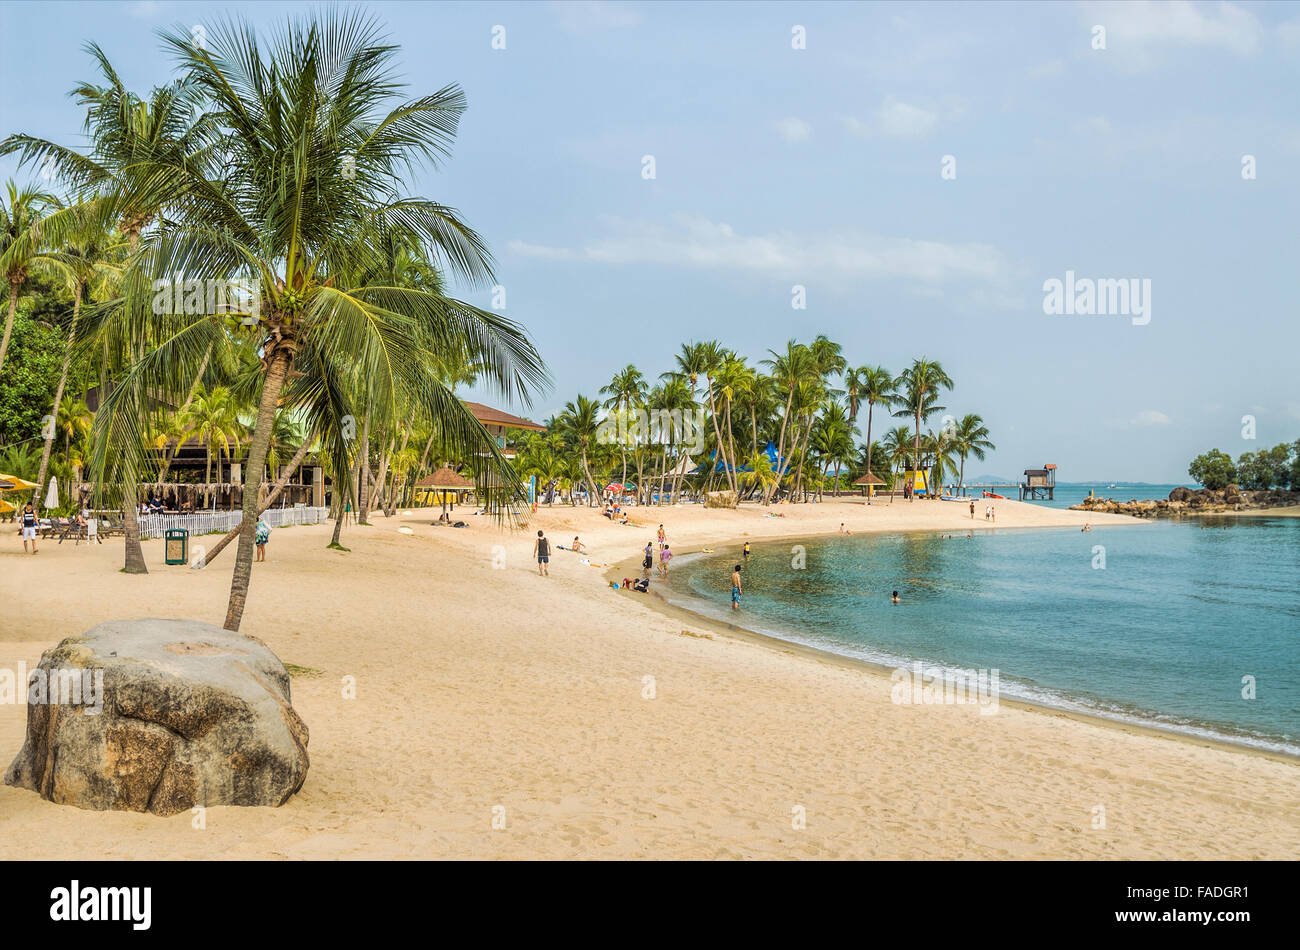 Siloso Beach on Sentosa Island, Singapore | Siloso Beach auf der Insel Sentosa, Singapur - Stock Image